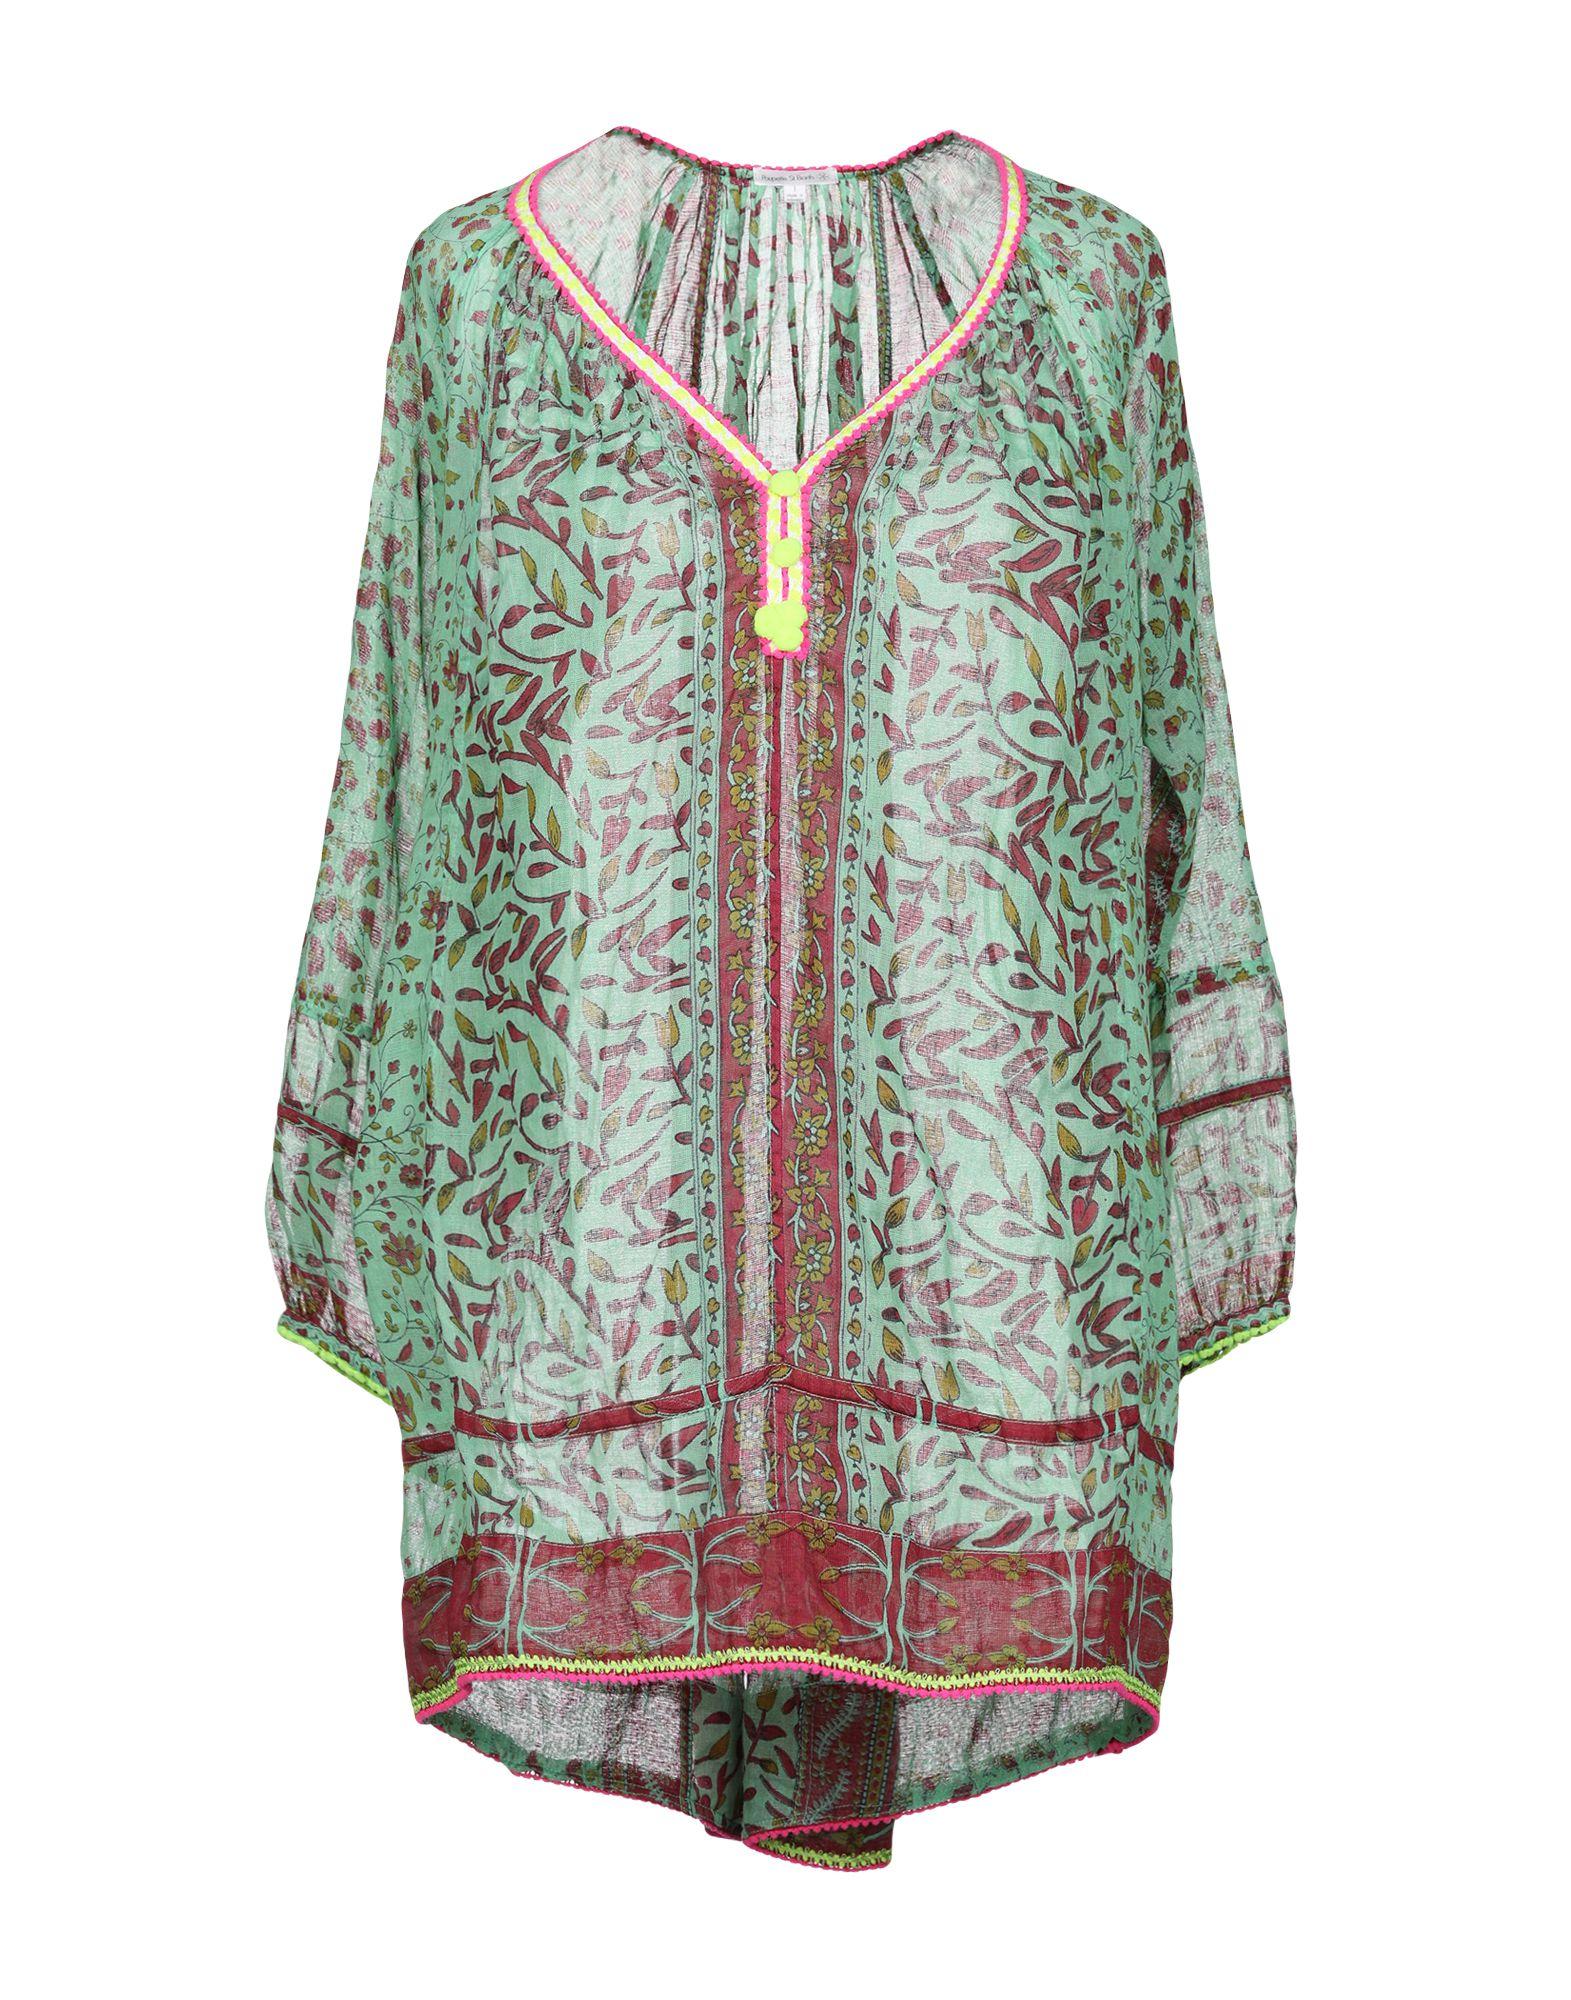 POUPETTE ST BARTH Блузка free in st barth повседневные шорты